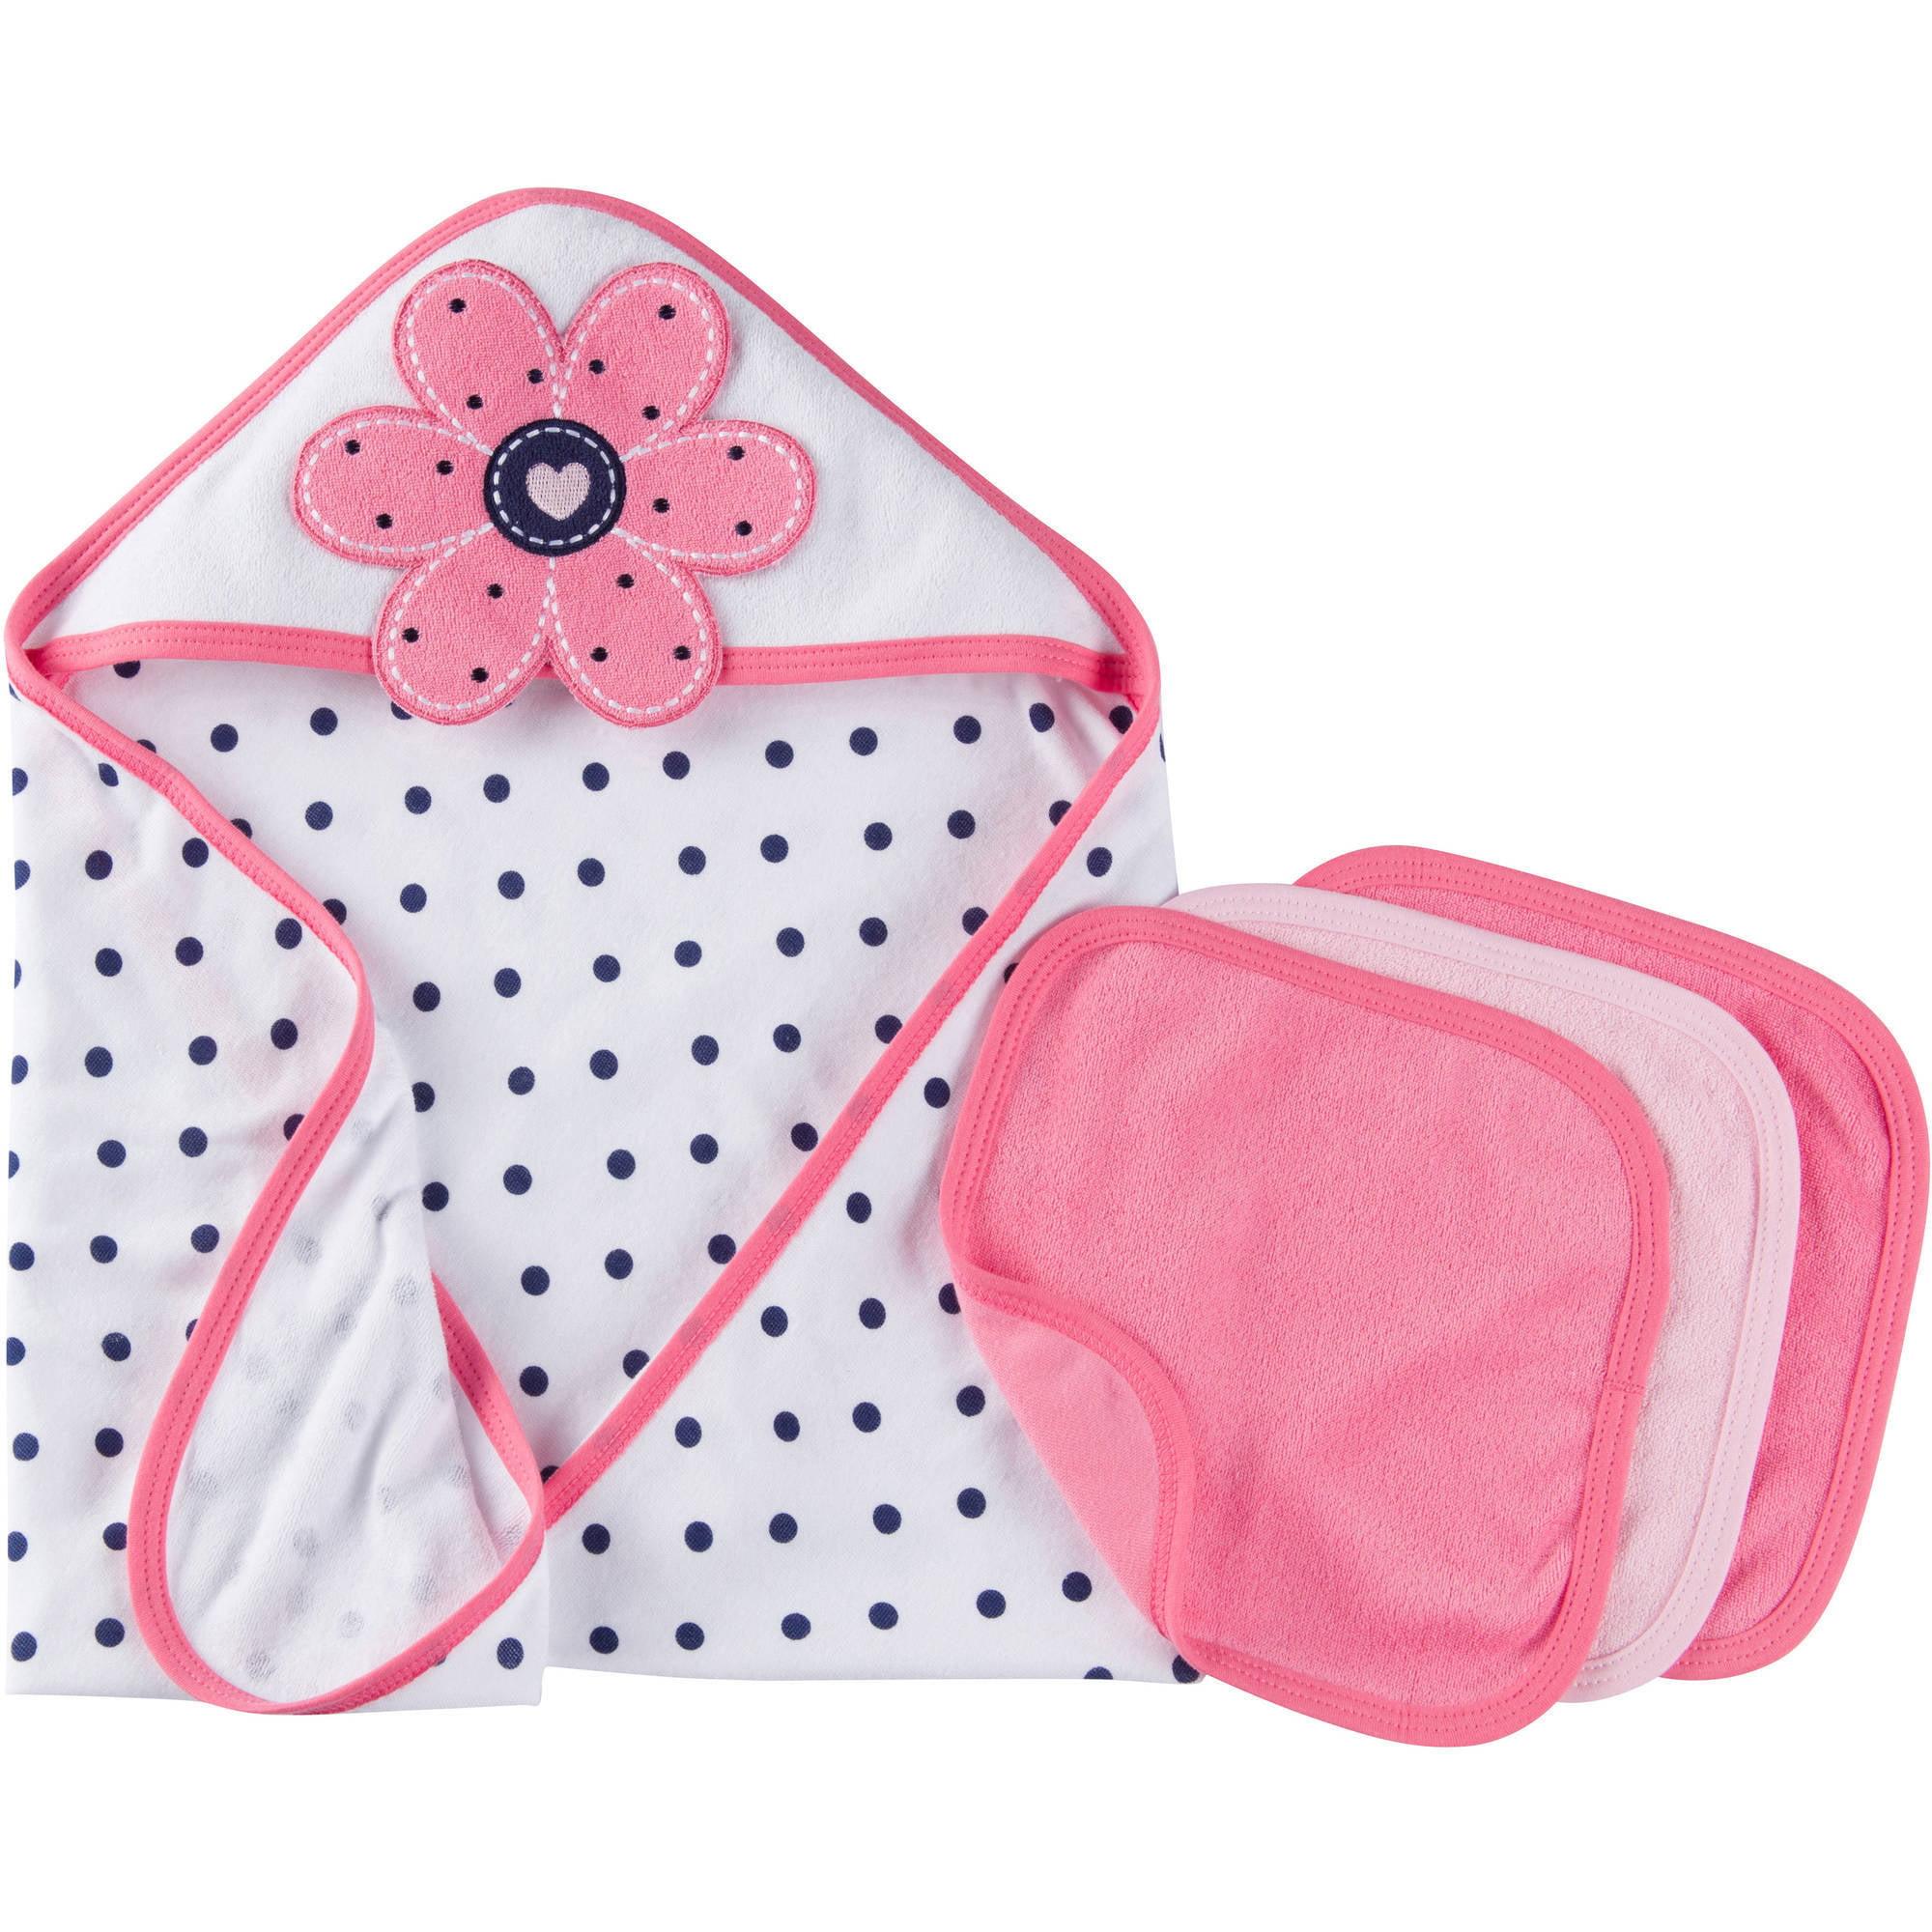 Gerber Newborn Baby Girl Towel and Washcloths Bath Essentials 4-Piece Gift Set